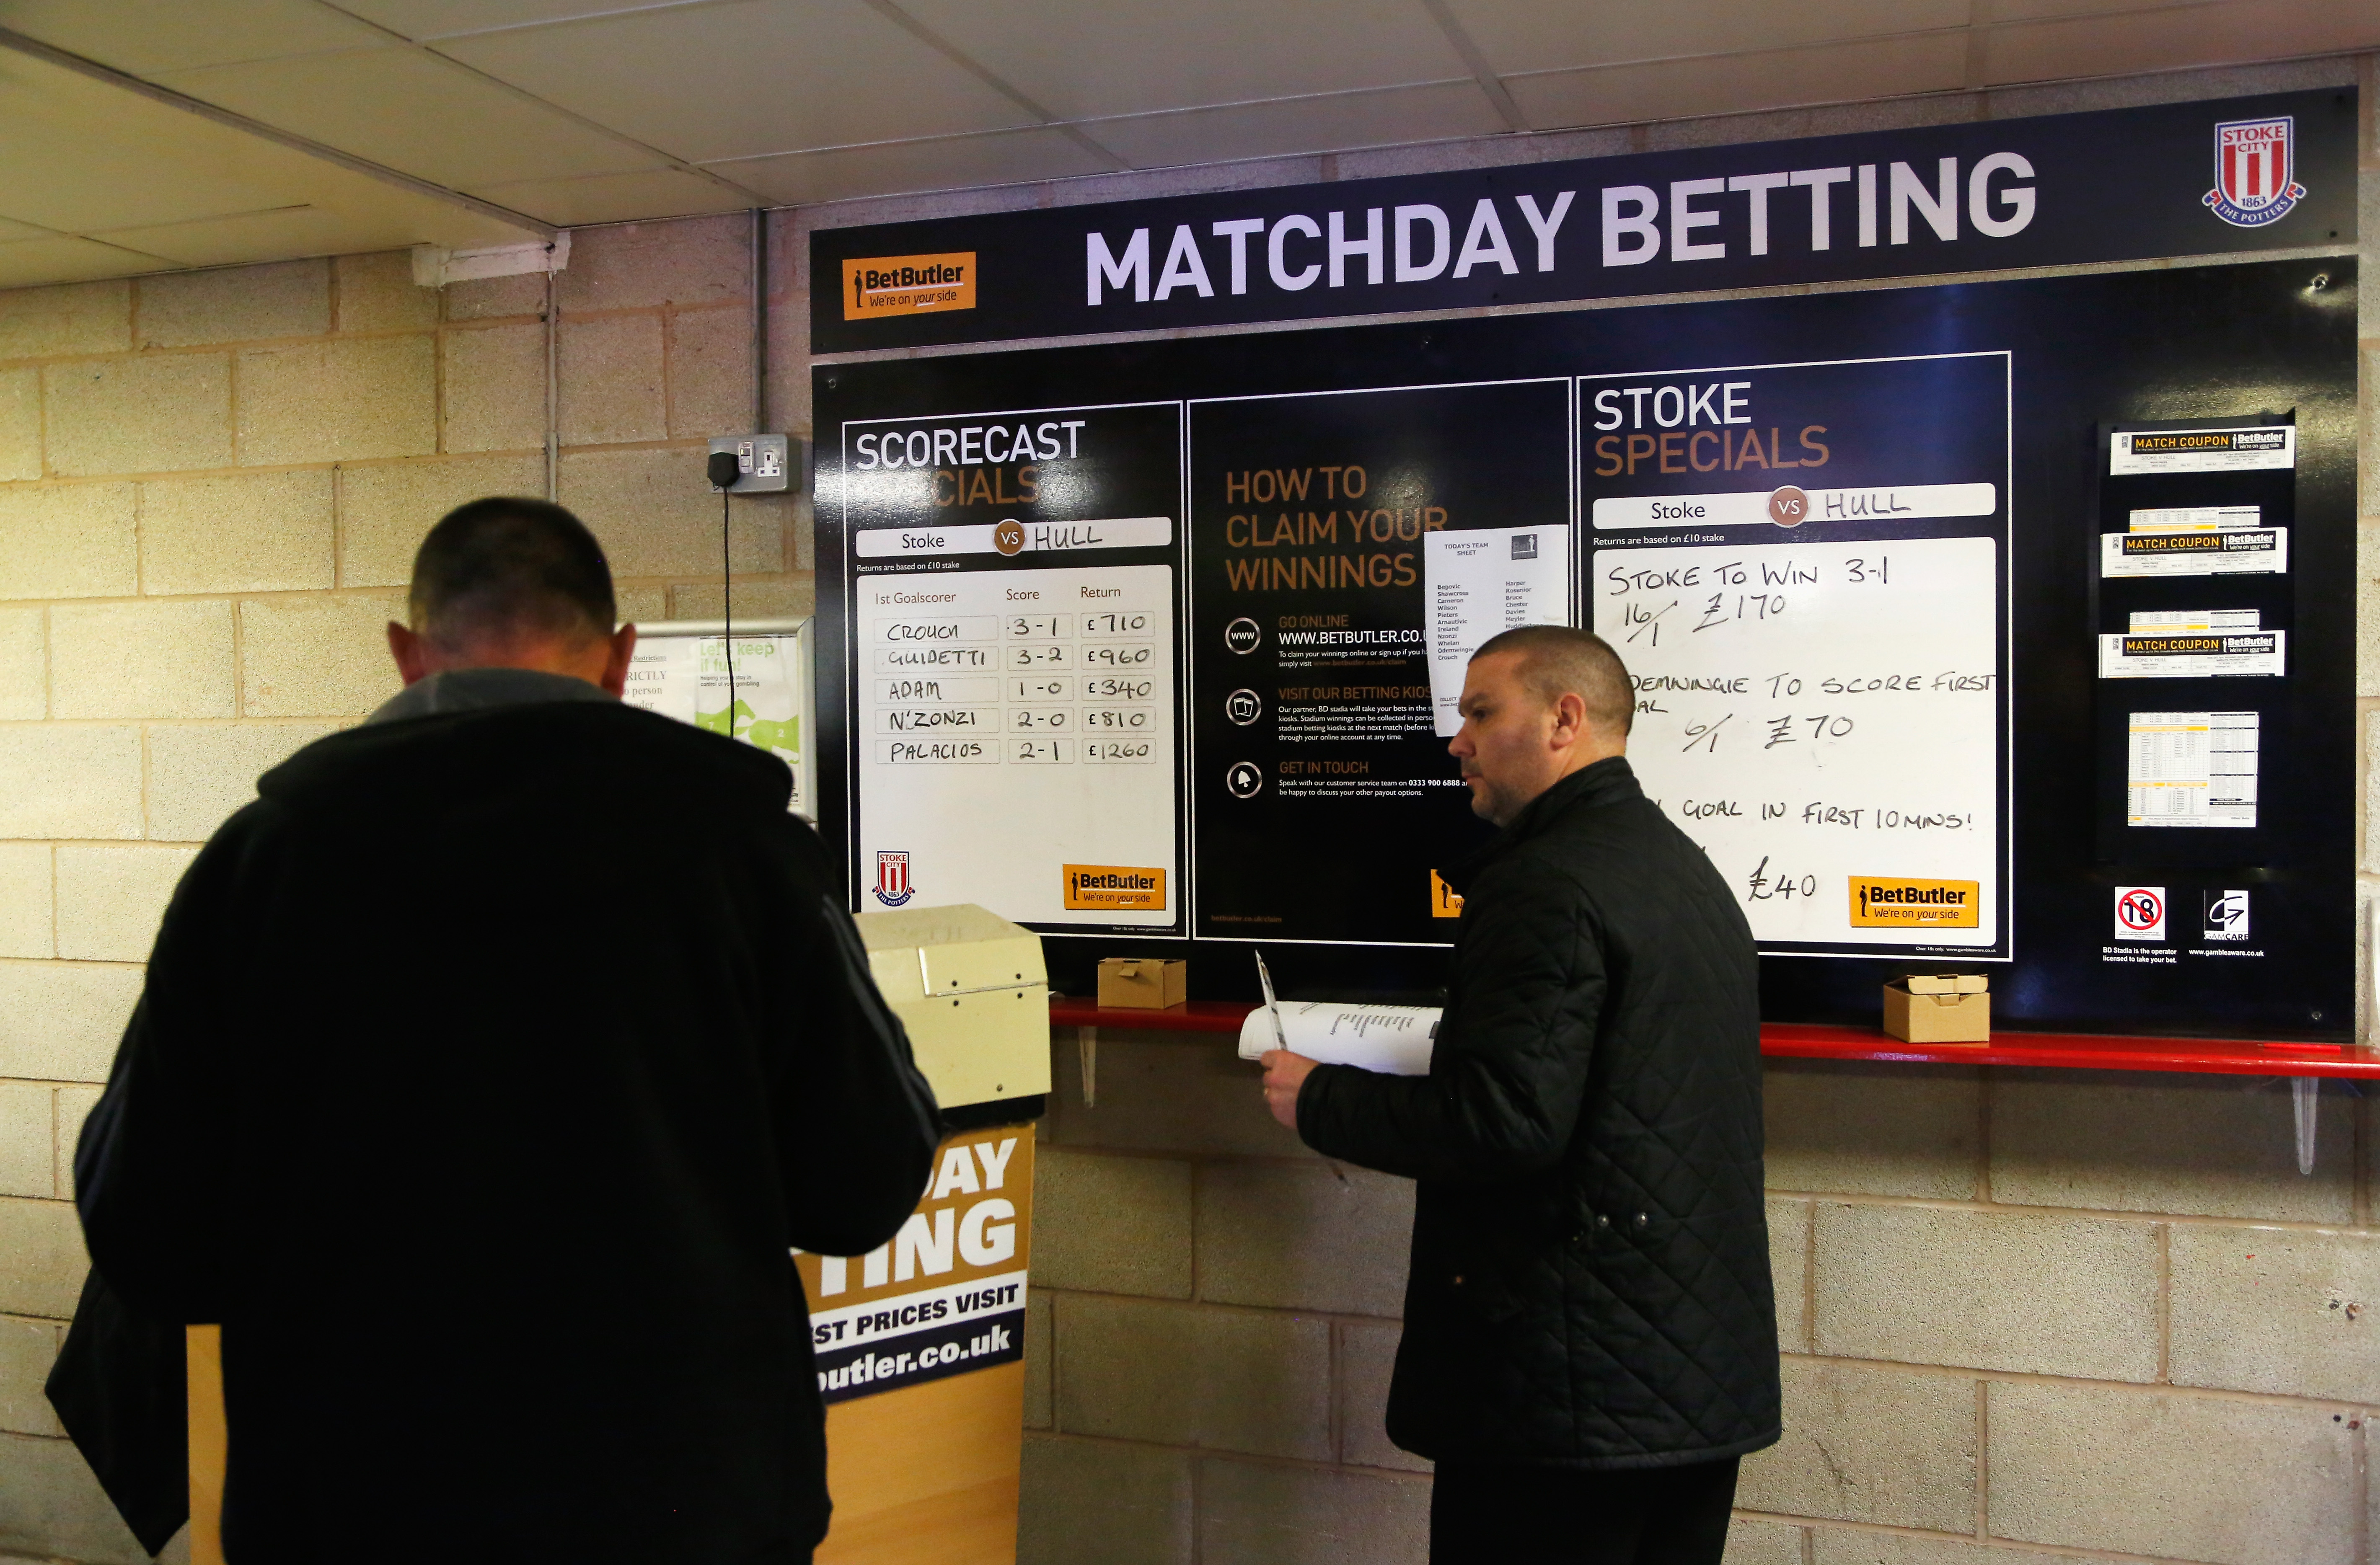 Stoke City v Hull City - Premier League